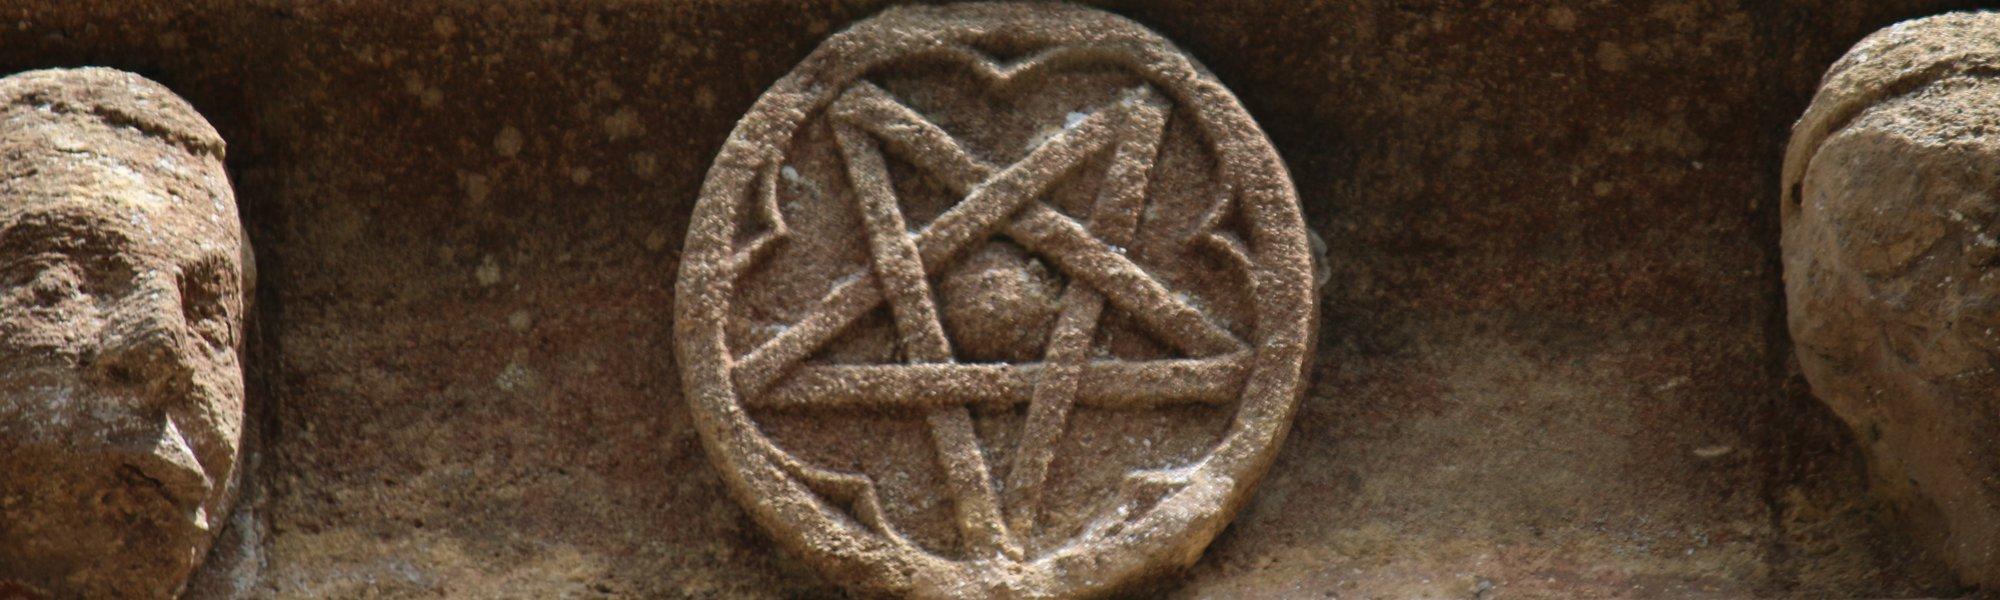 Pentagram carving, Church of St. Mary the Virgin, Adderbury